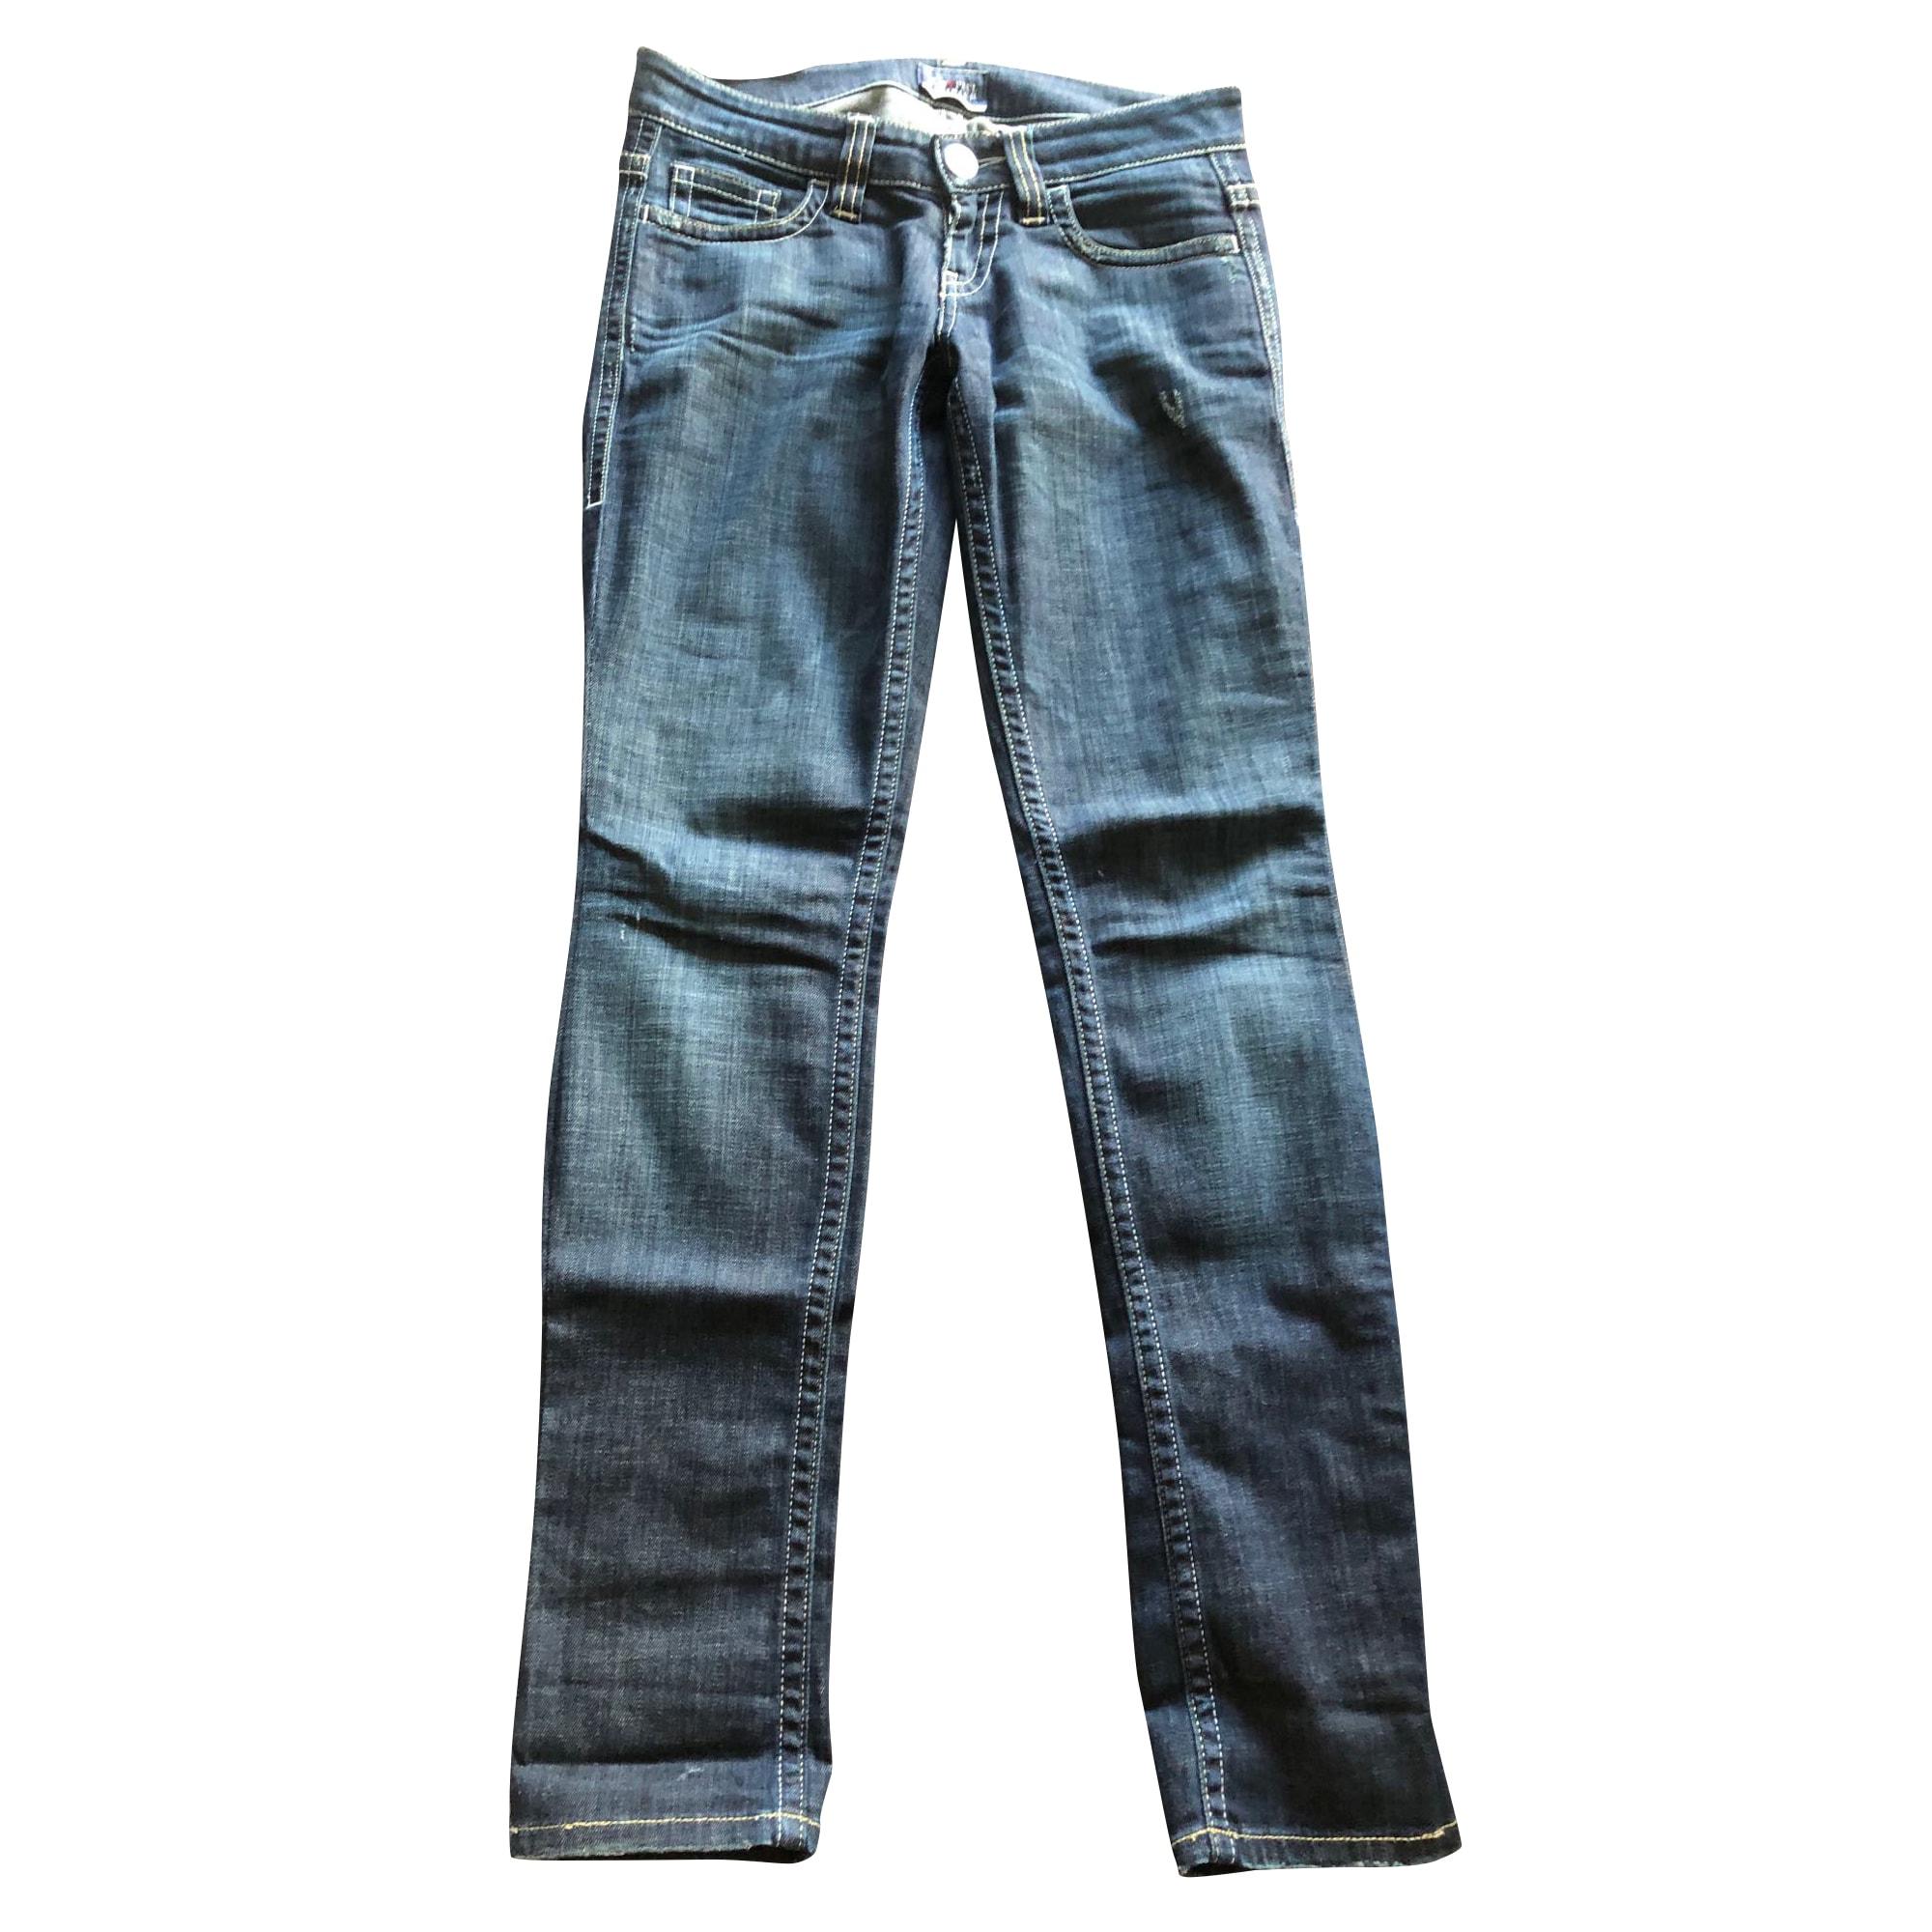 Jeans slim JEAN PAUL GAULTIER Bleu, bleu marine, bleu turquoise